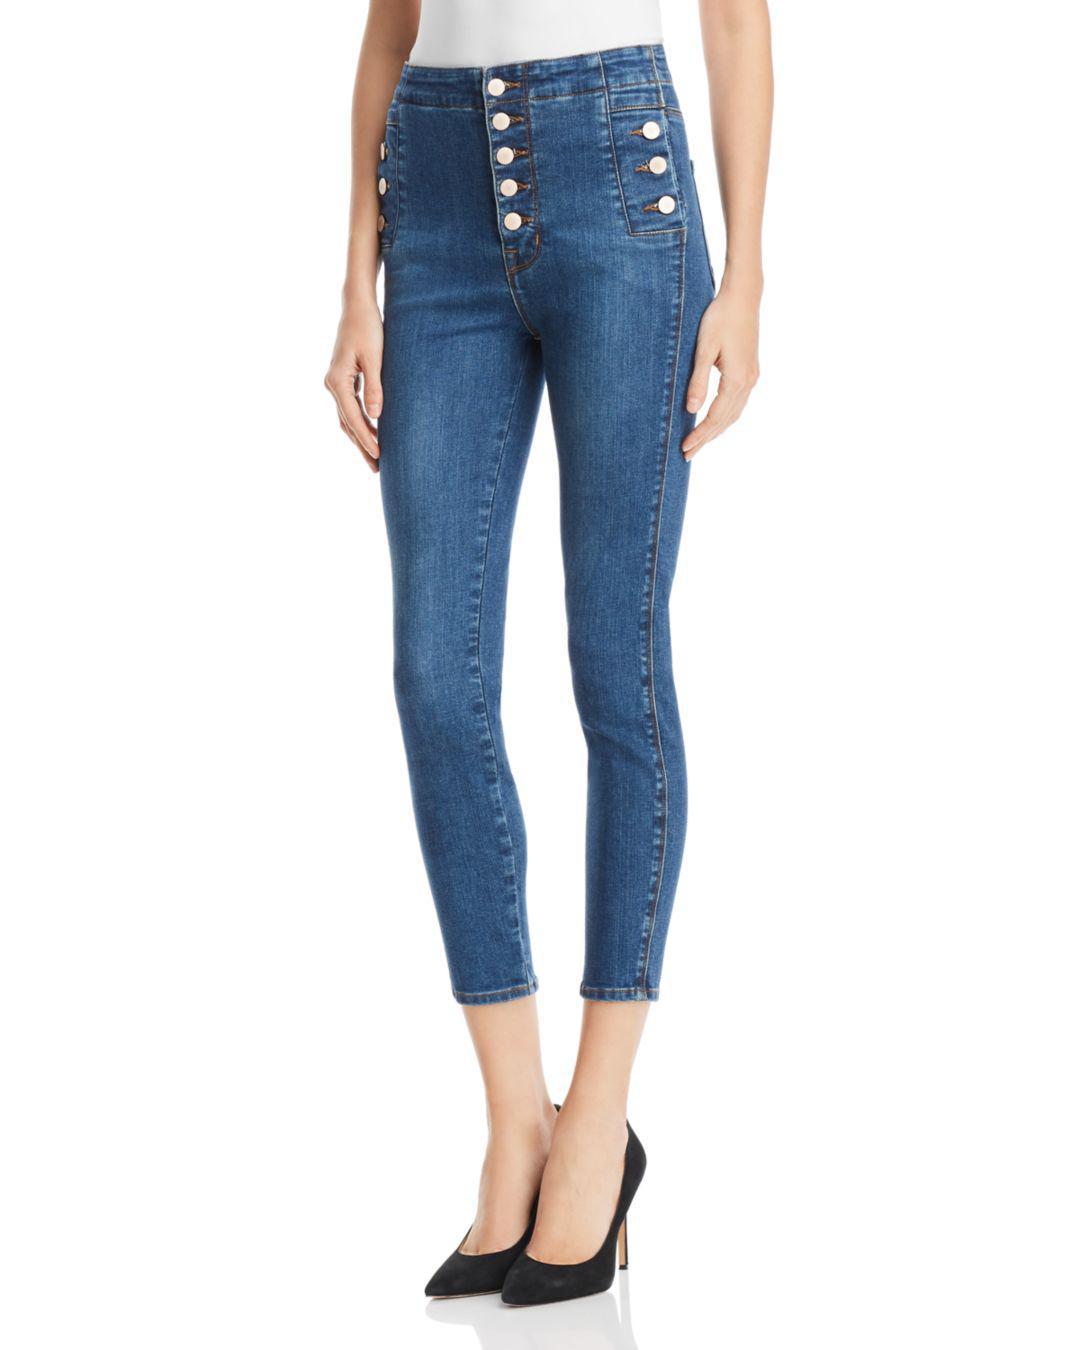 a0acaa69cee J Brand Natasha Sky High Skinny Crop Jeans In Lovesick in Blue - Lyst